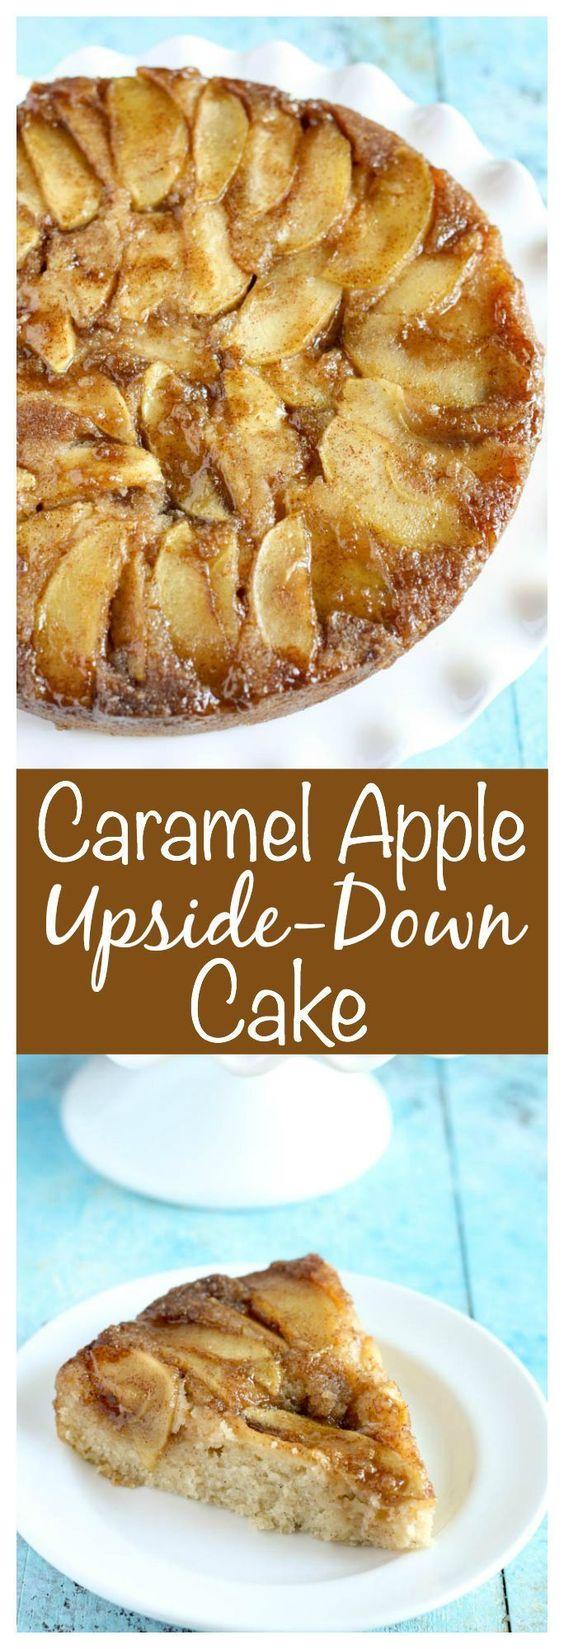 Caramel Apple Upside-Down Cake | Recipe | Caramel apples ...